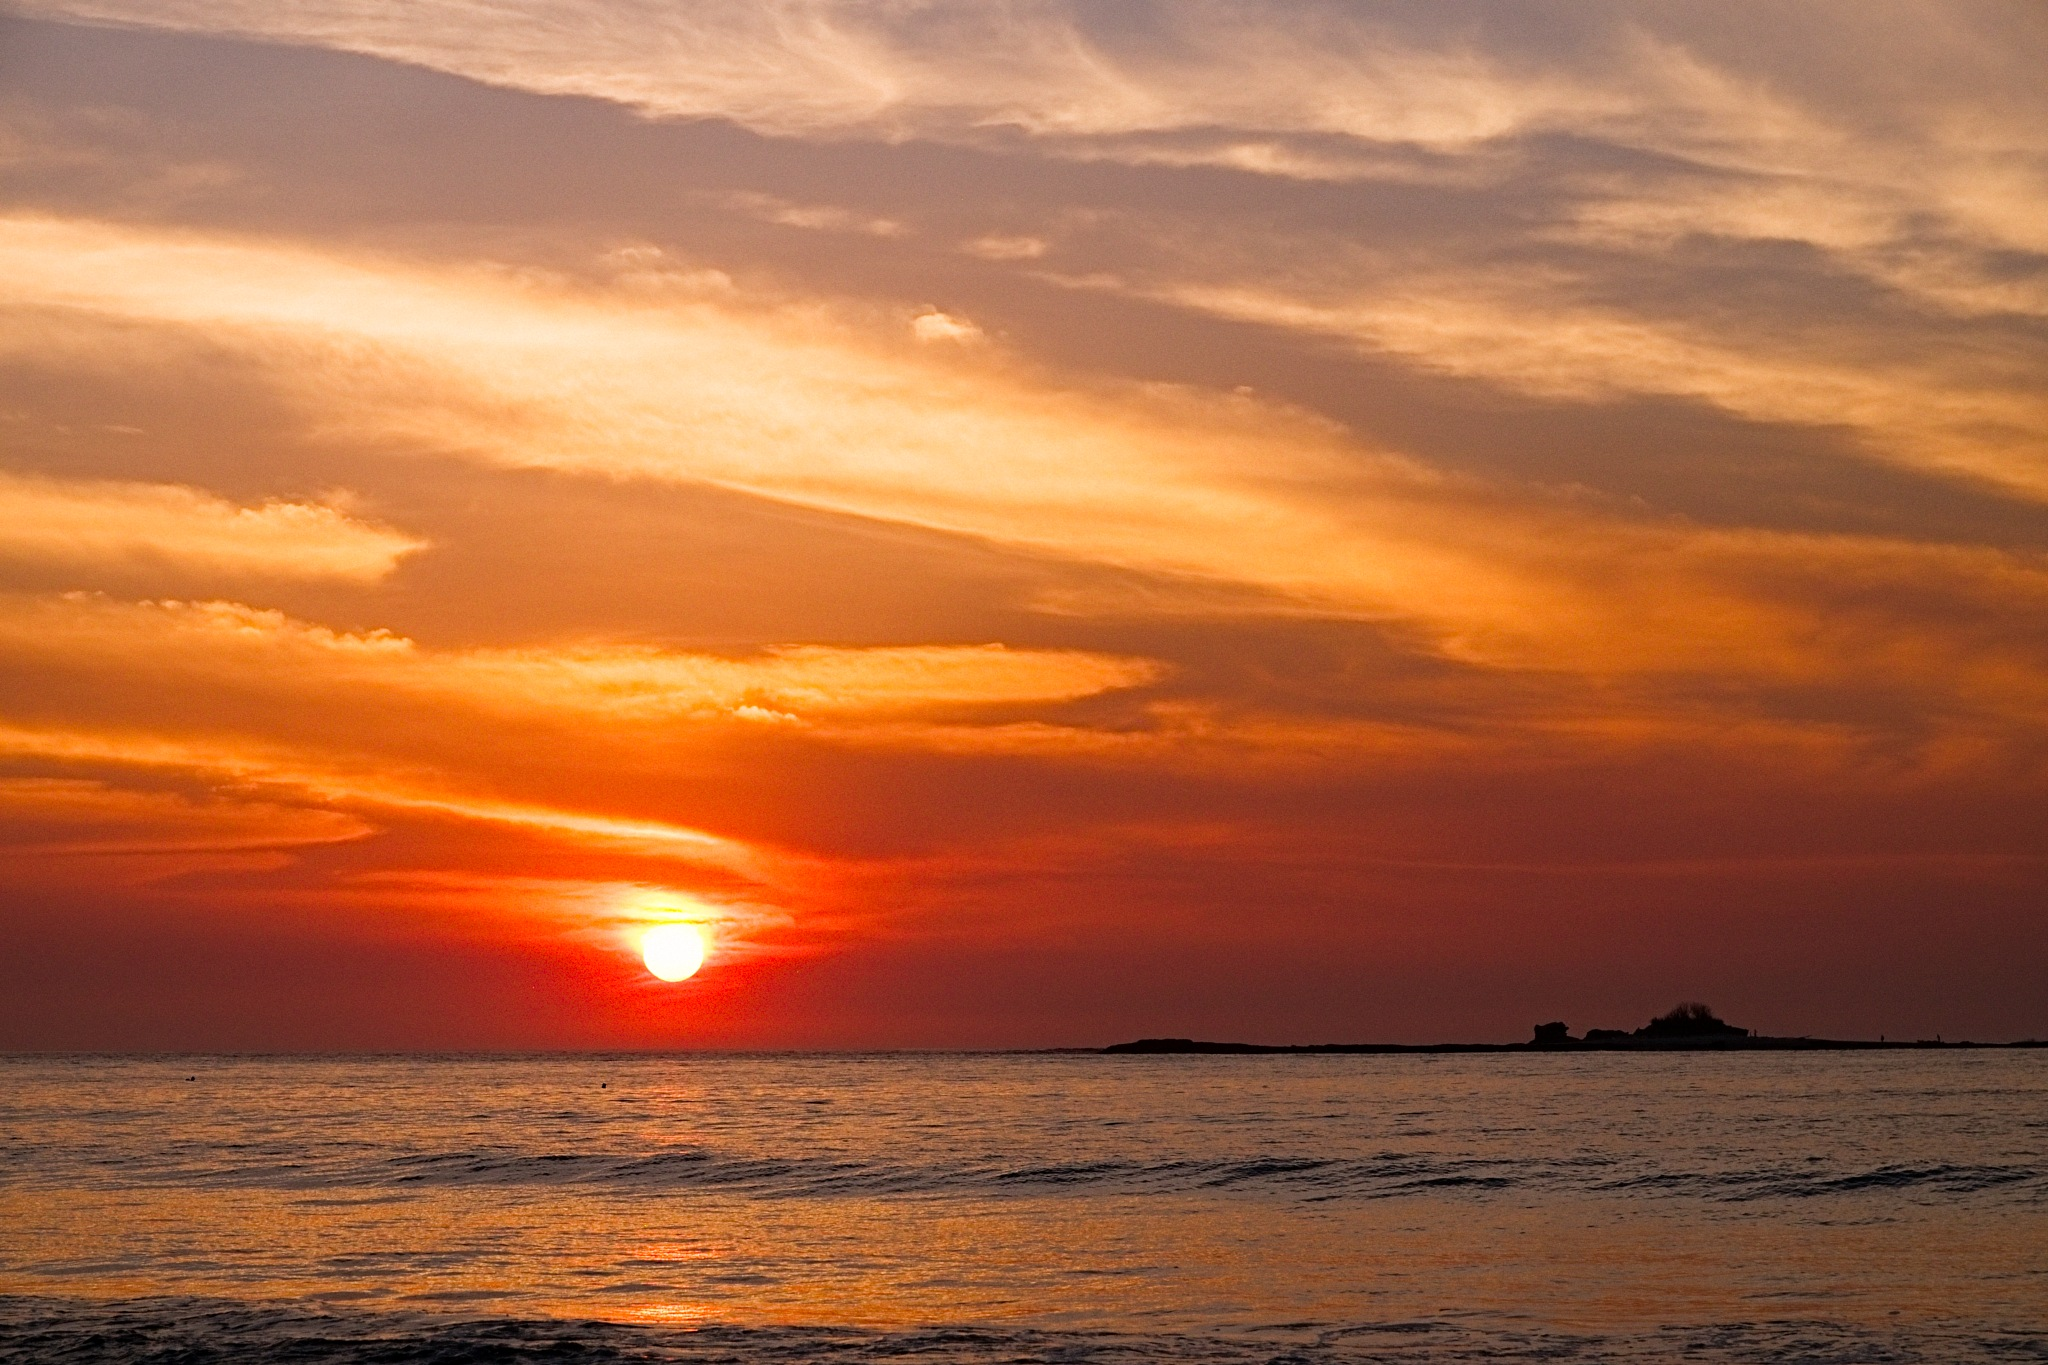 Sunset no. 2 Tamarindo Bay by Smilin' Dog